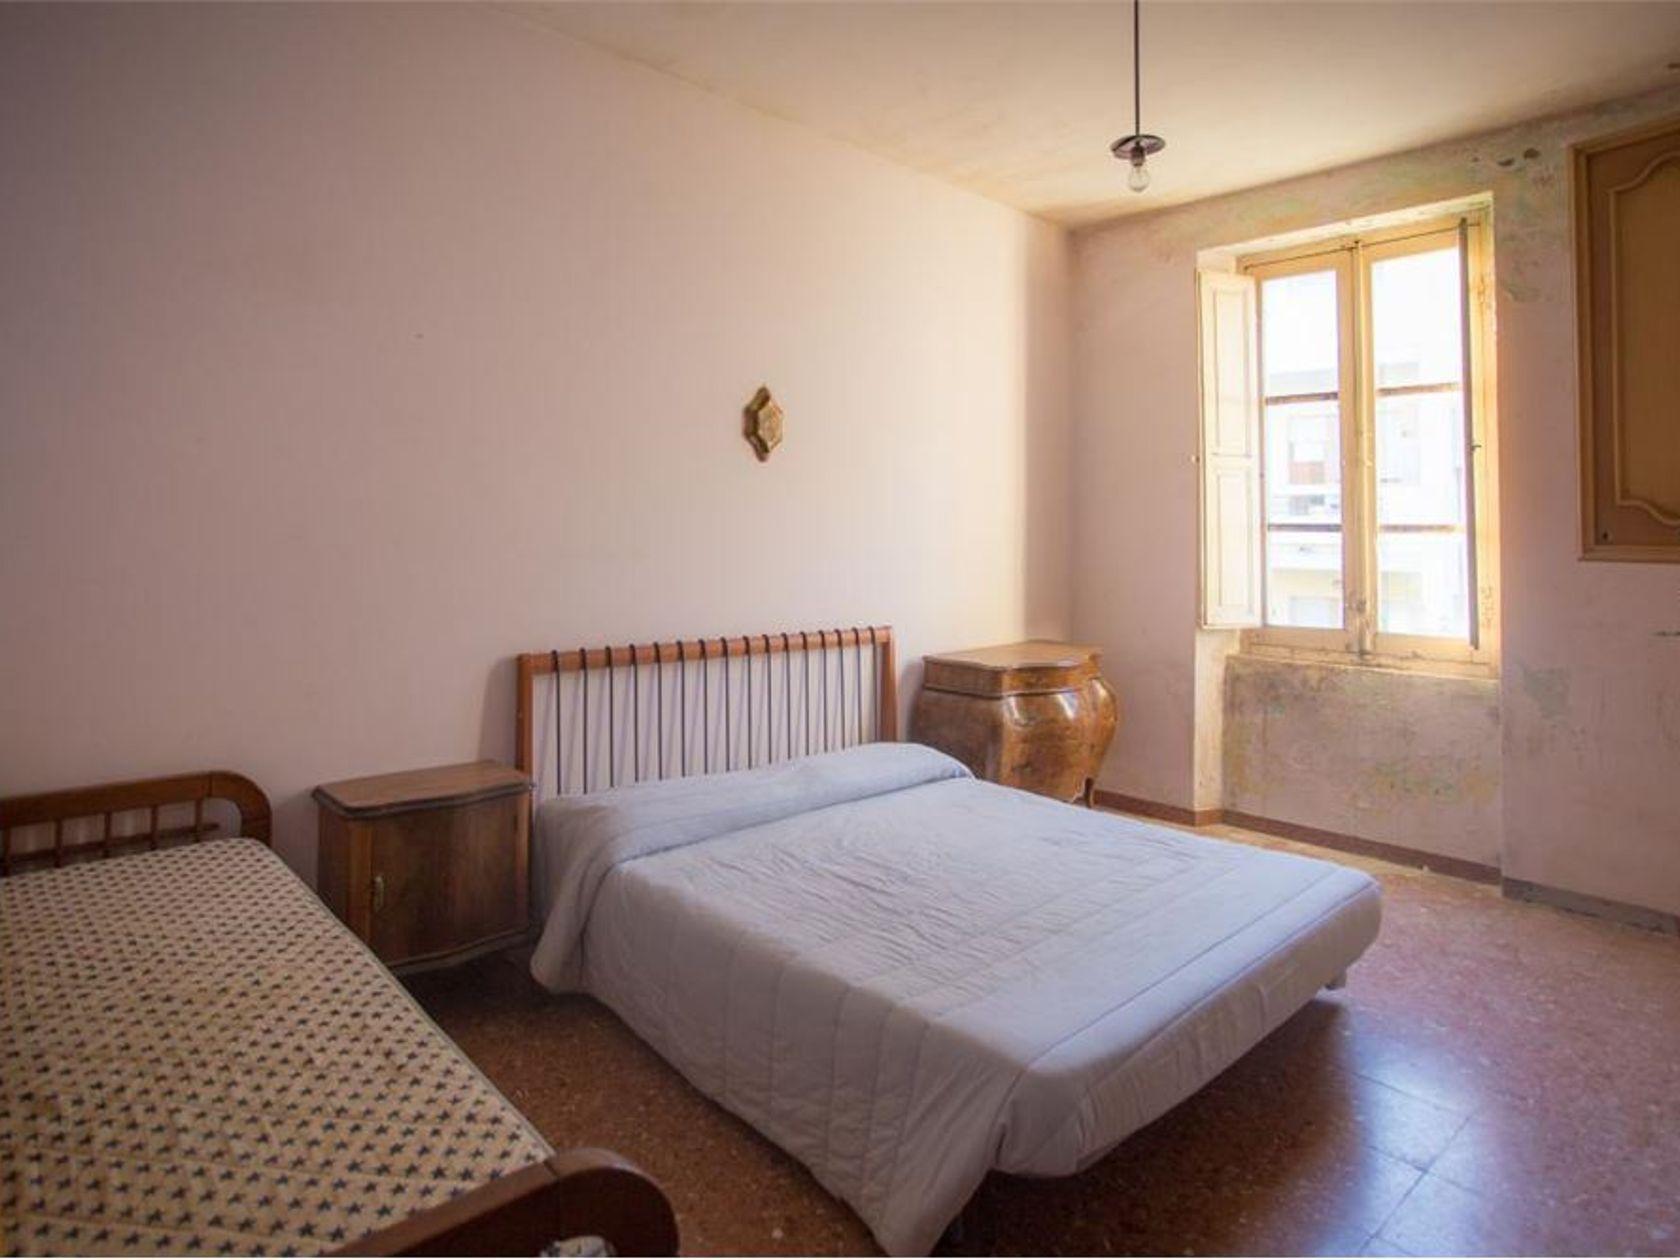 Appartamento Zona Ospedale, Pescara, PE Vendita - Foto 6